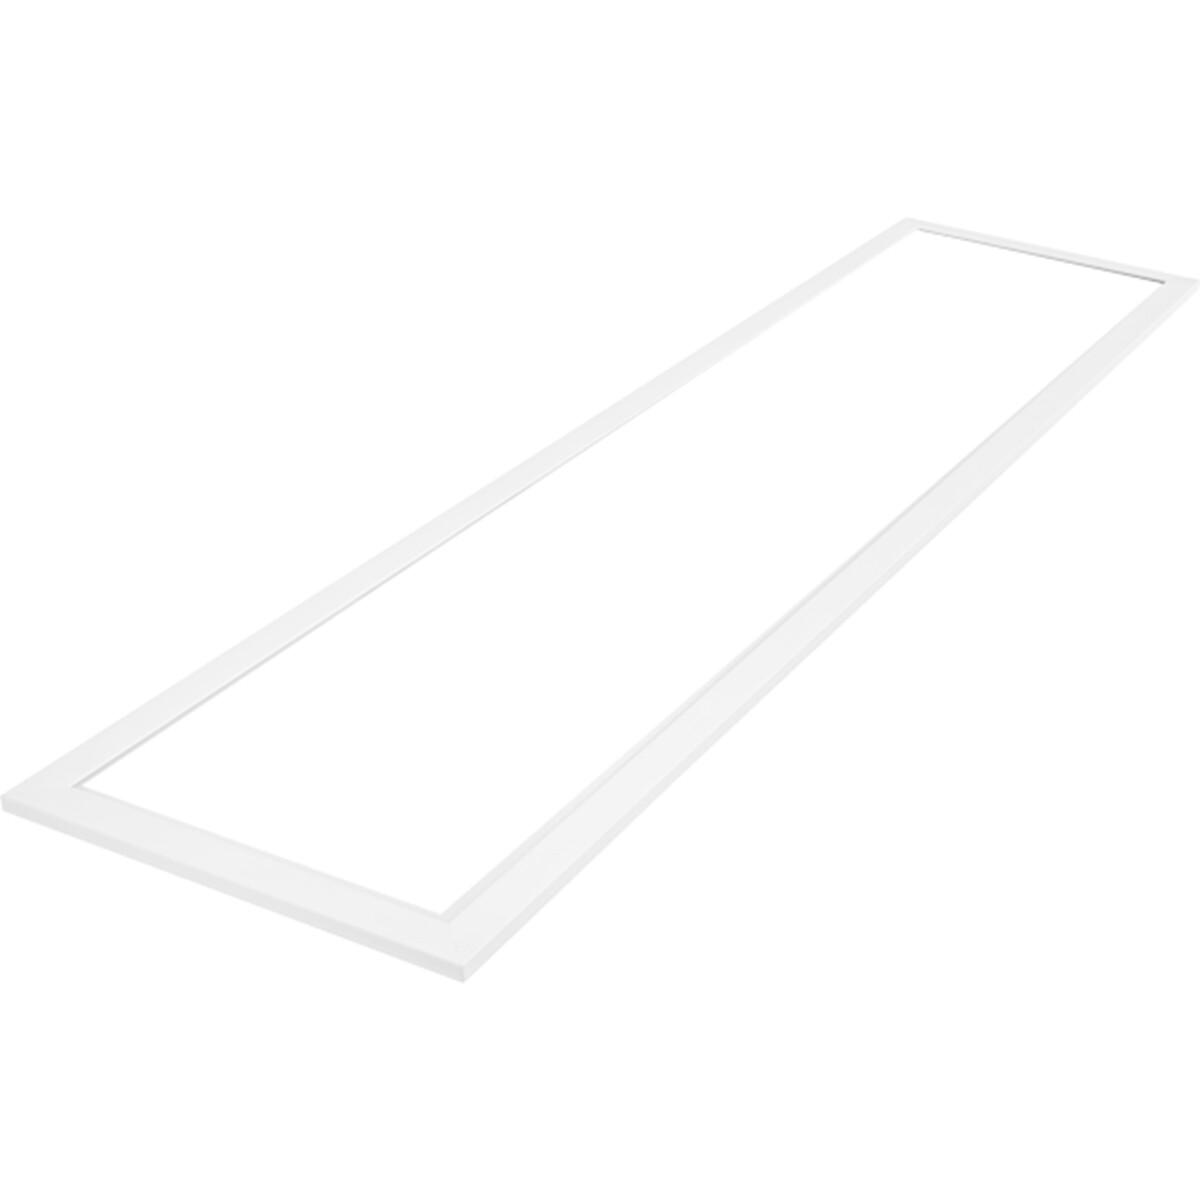 LED Paneel - Aigi - 30x120 Helder/Koud Wit 6000K - 40W Inbouw Rechthoek - Mat Wit - Aluminium - Flik